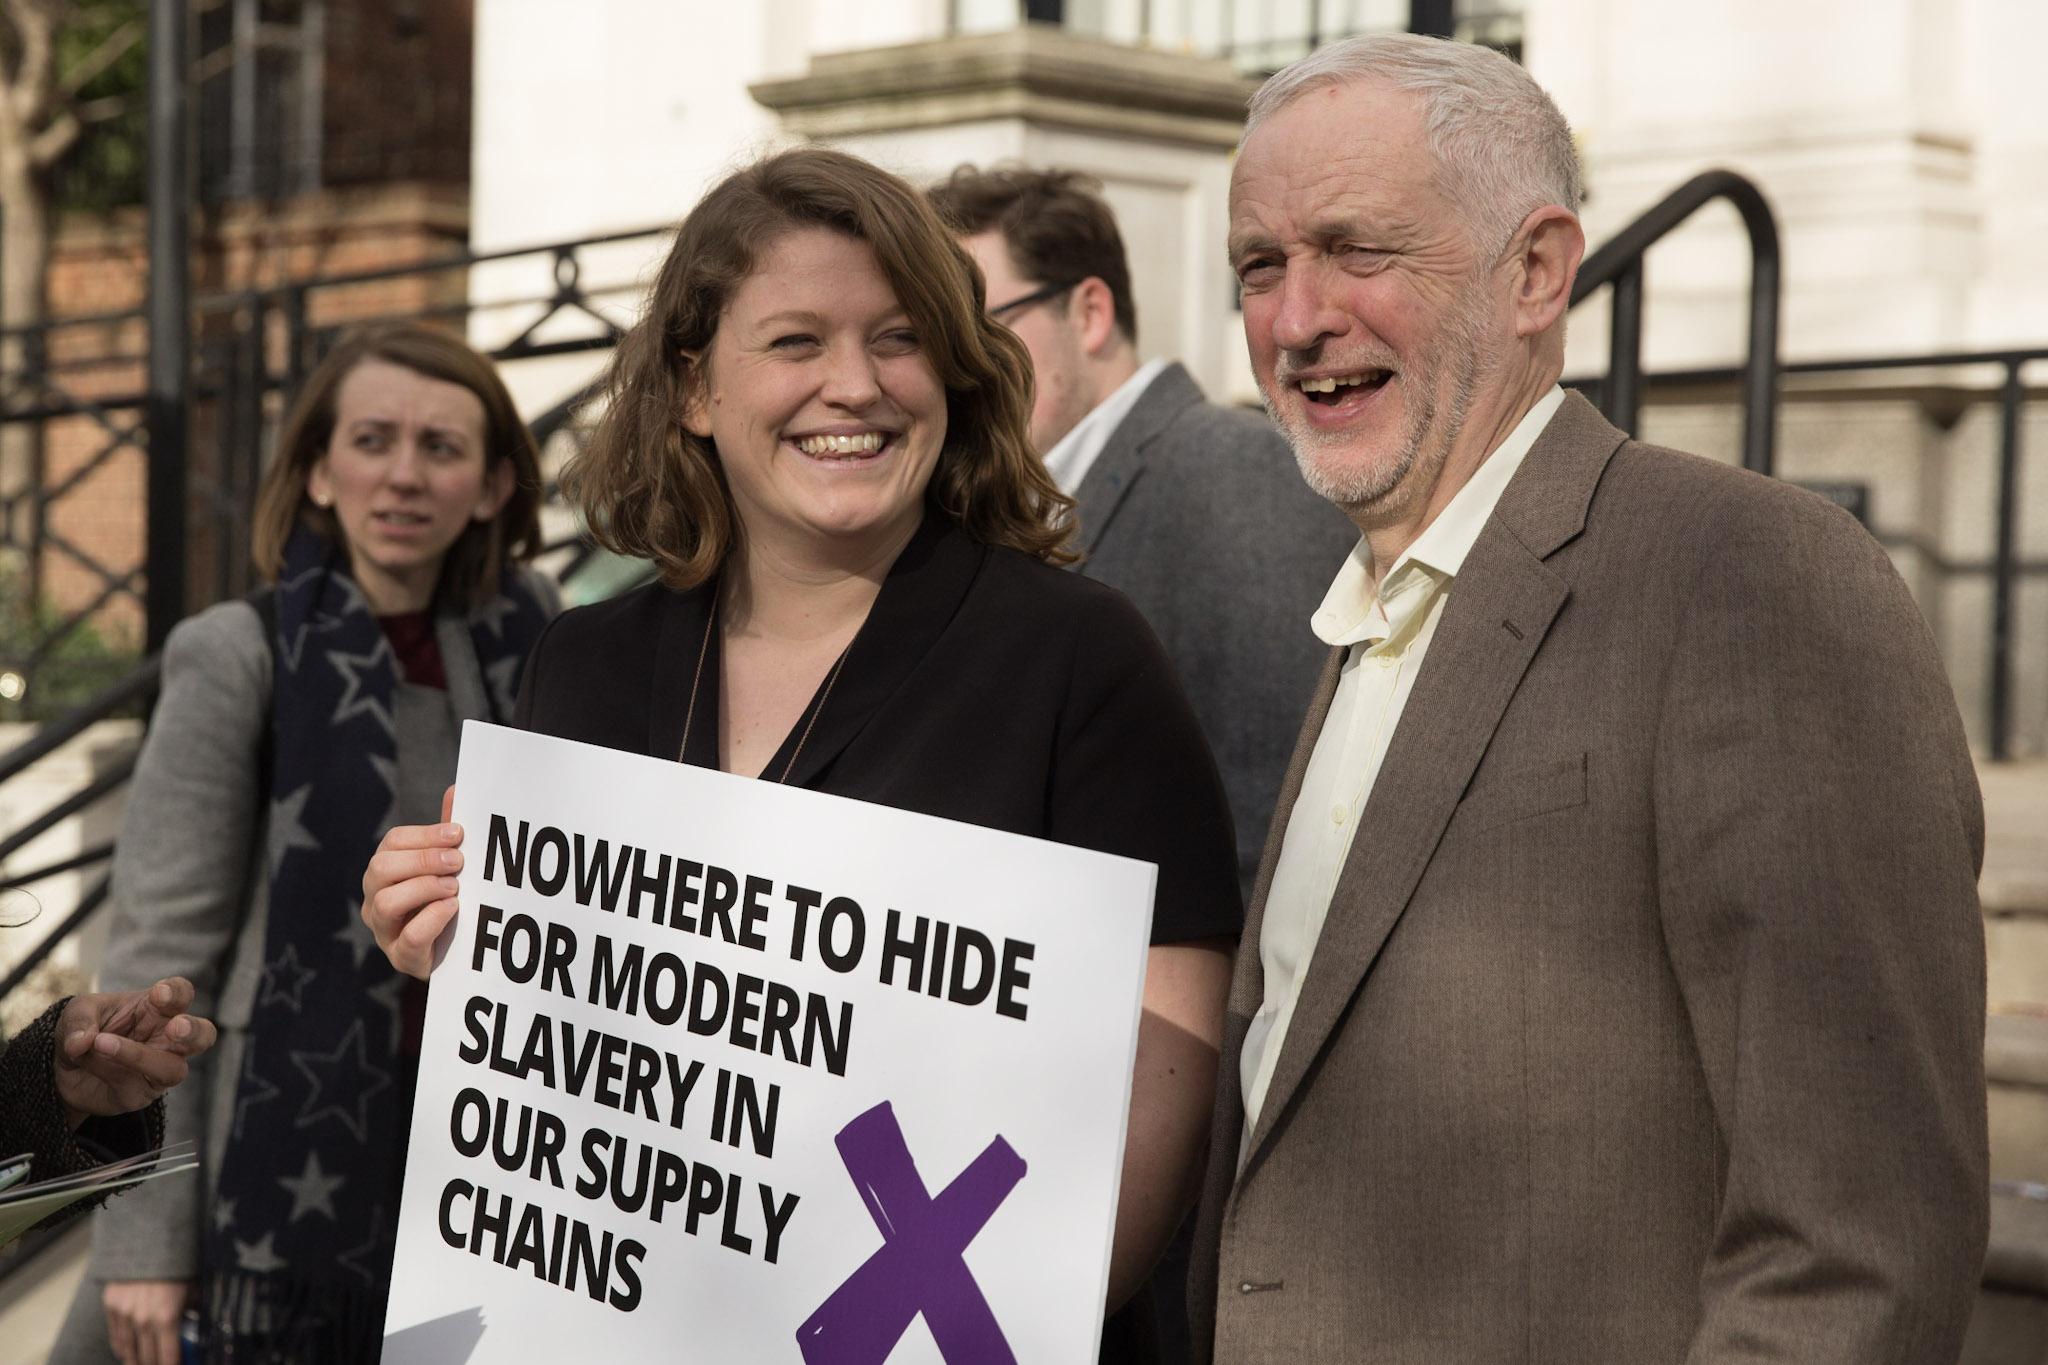 Anna_JC_modern_slavery_2.jpg